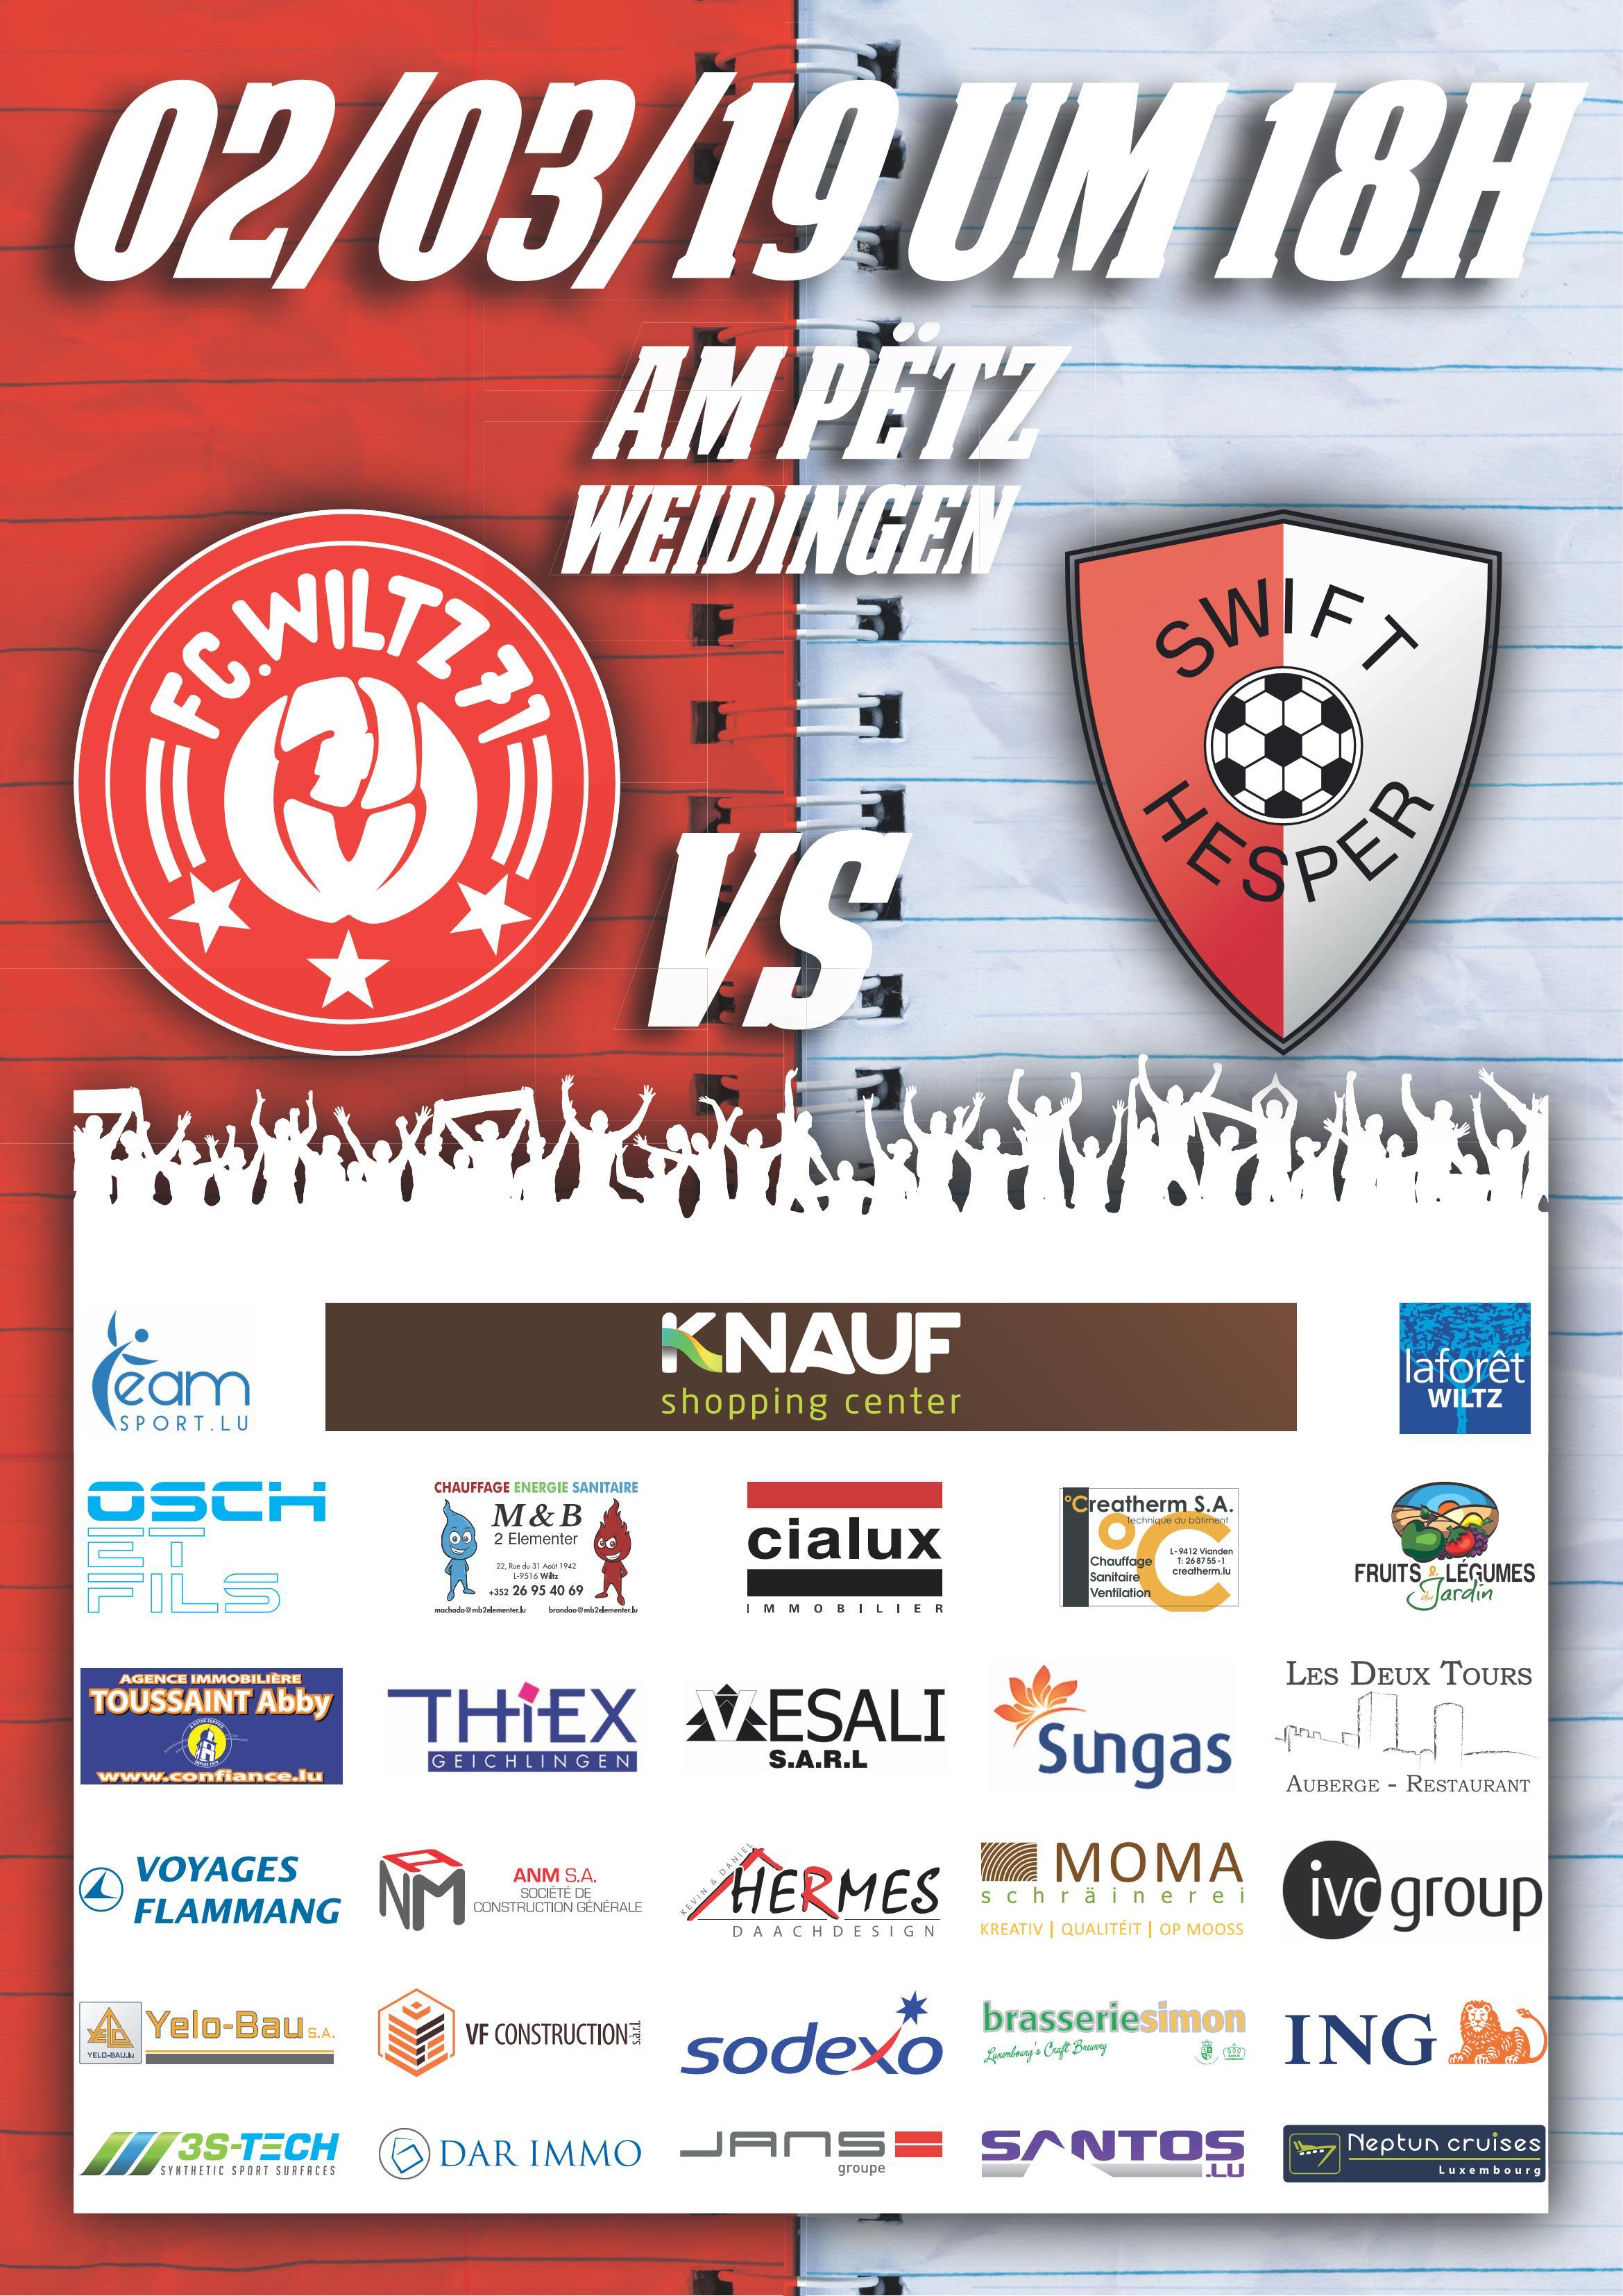 FC Wooltz 71 vs Swift Hesper